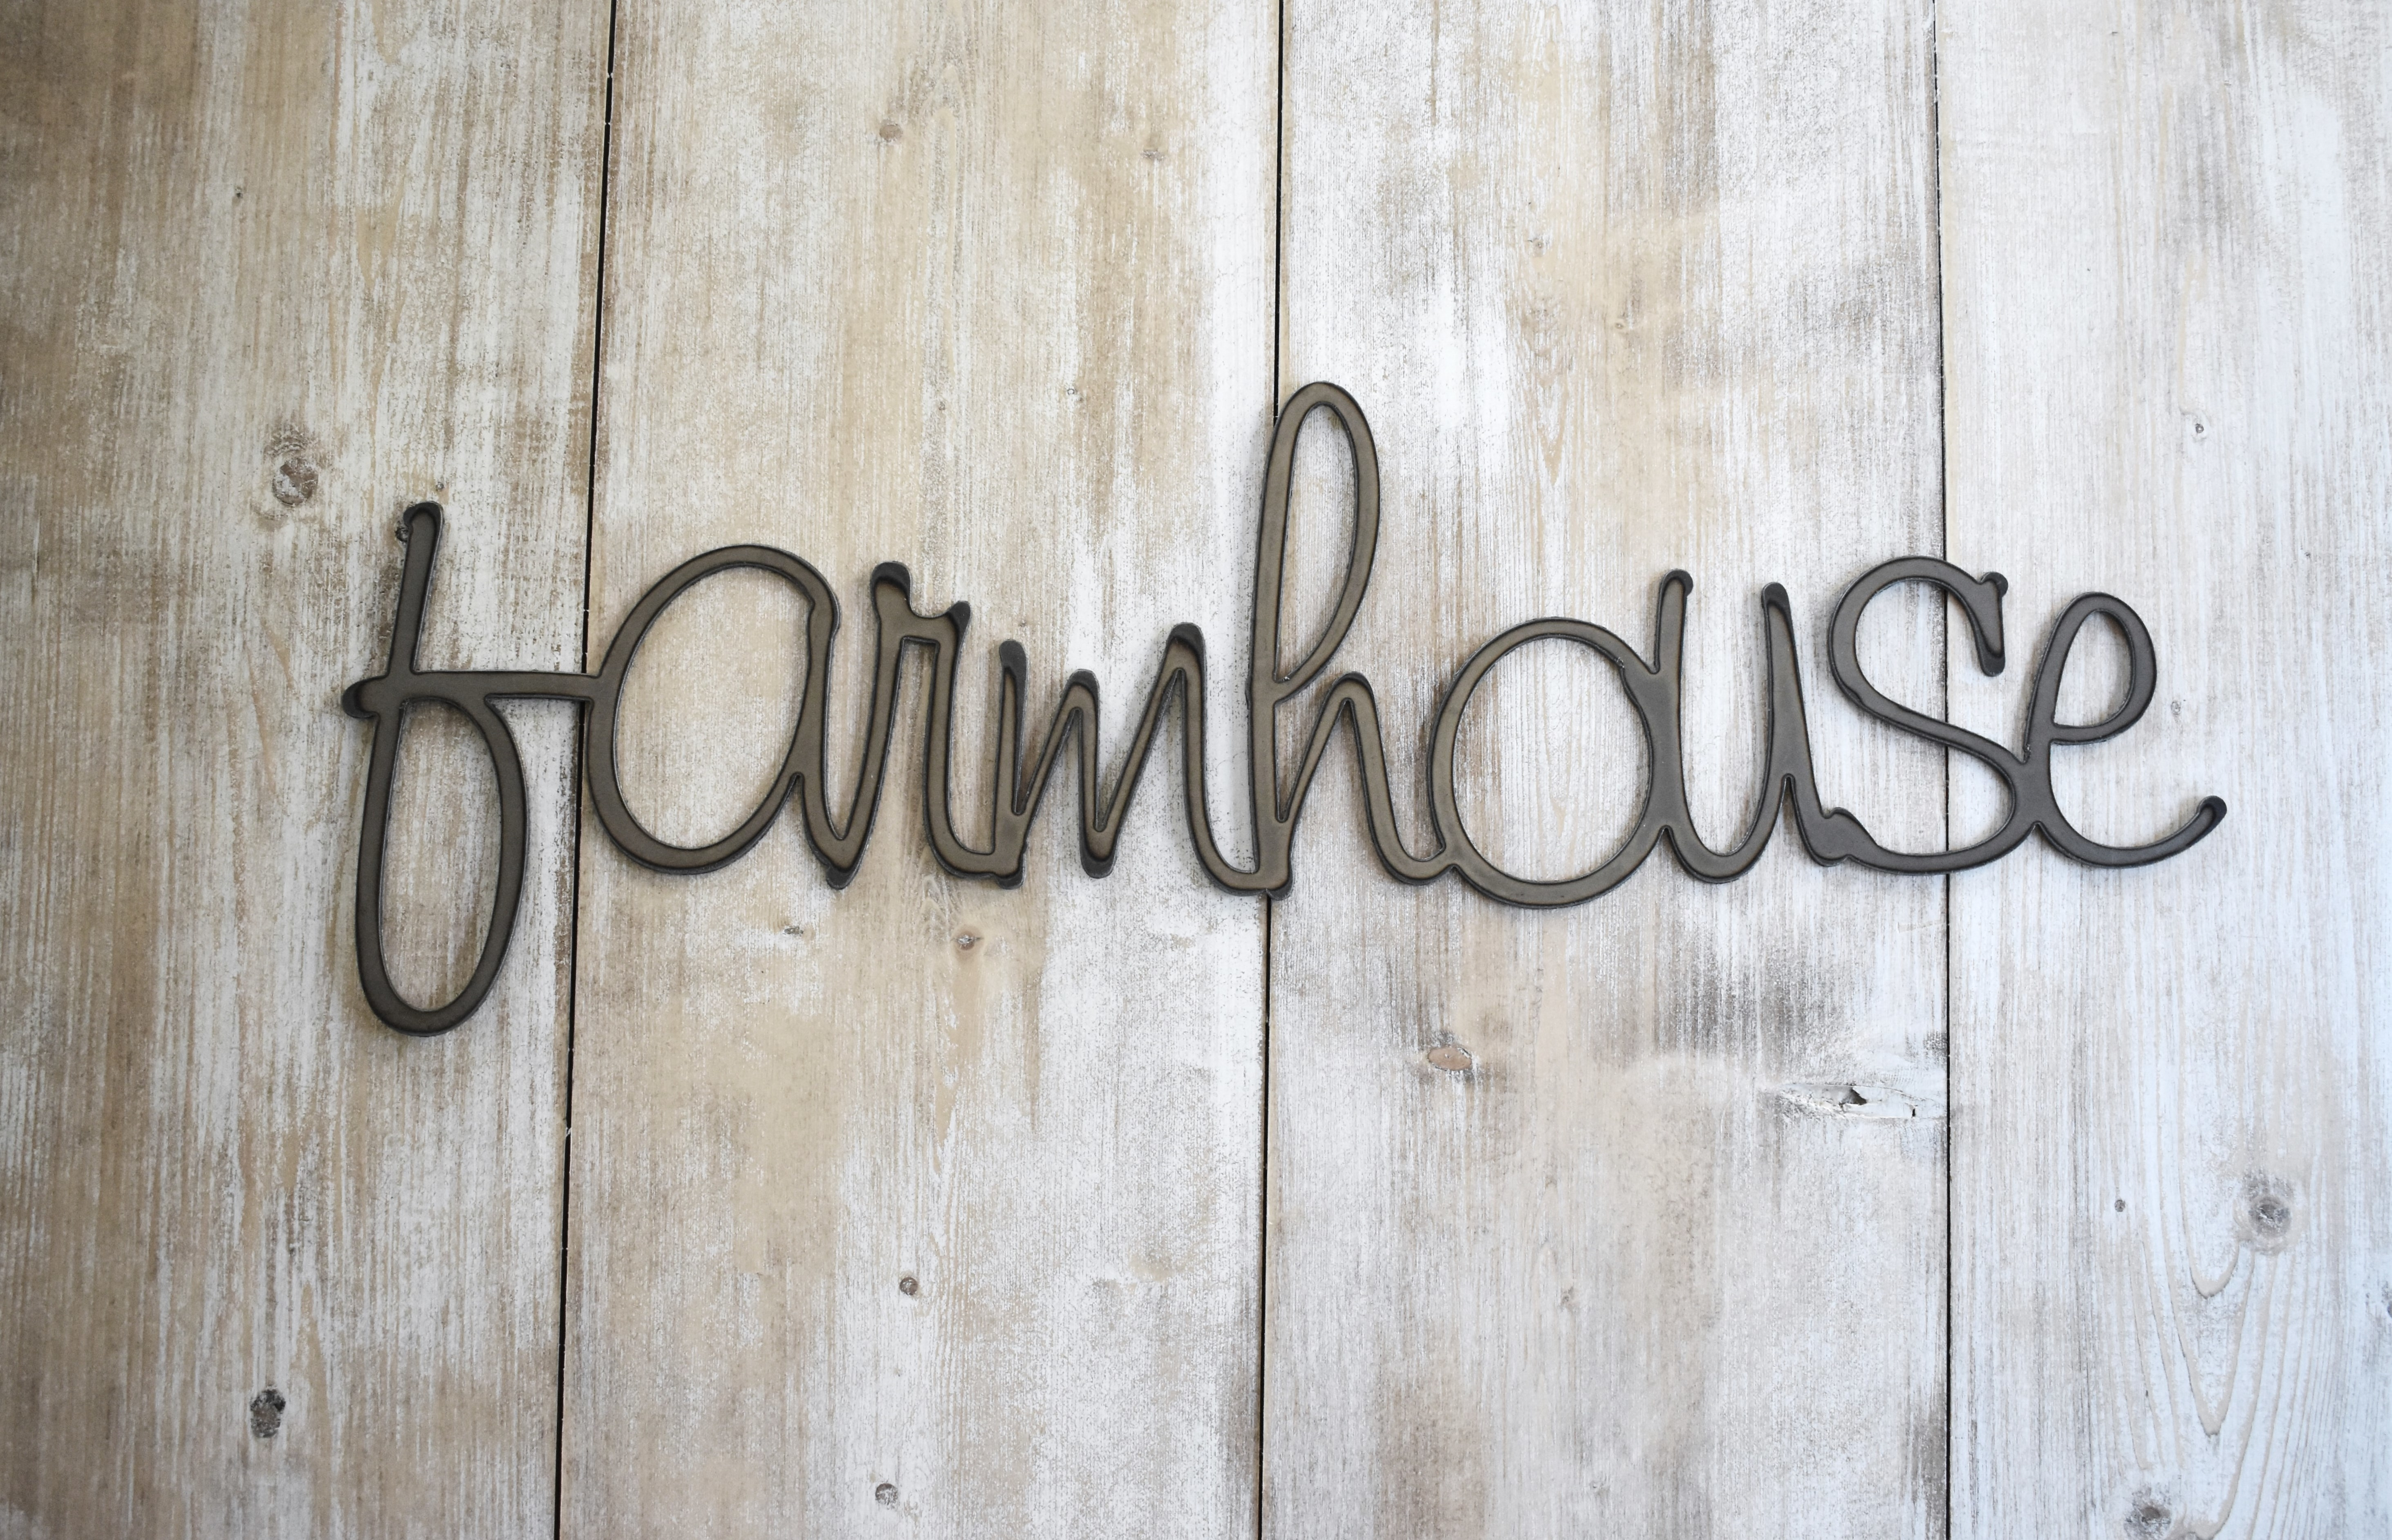 Farmhouse Word Art, Metal Sign, Wall Decor, Wall Hanging, Farmhouse Decor, Farmhouse Sign, Rustic Home Decor